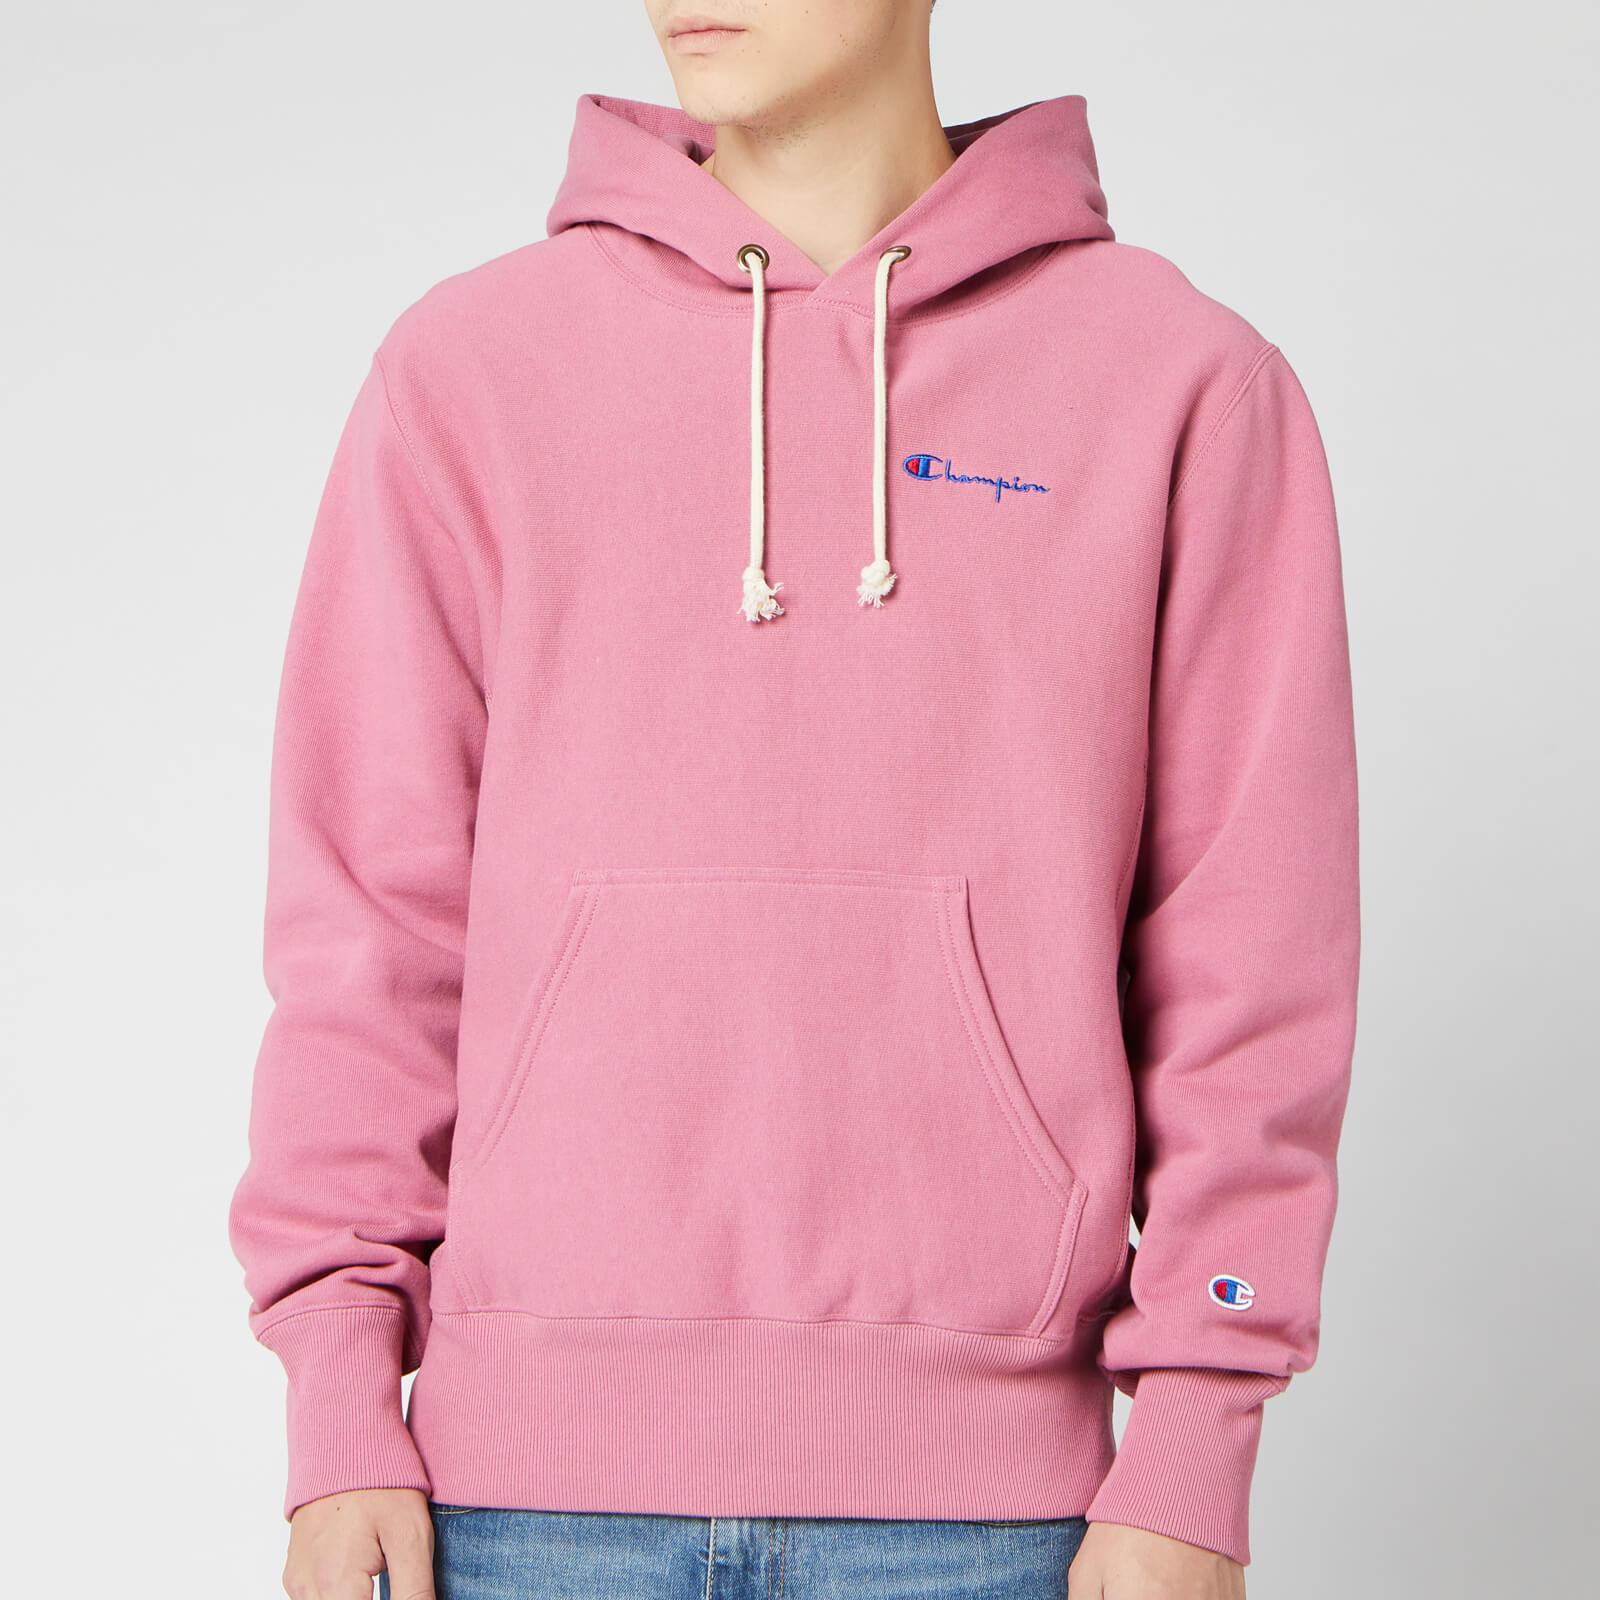 Champion Men's Small Script Hooded Sweatshirt Pink